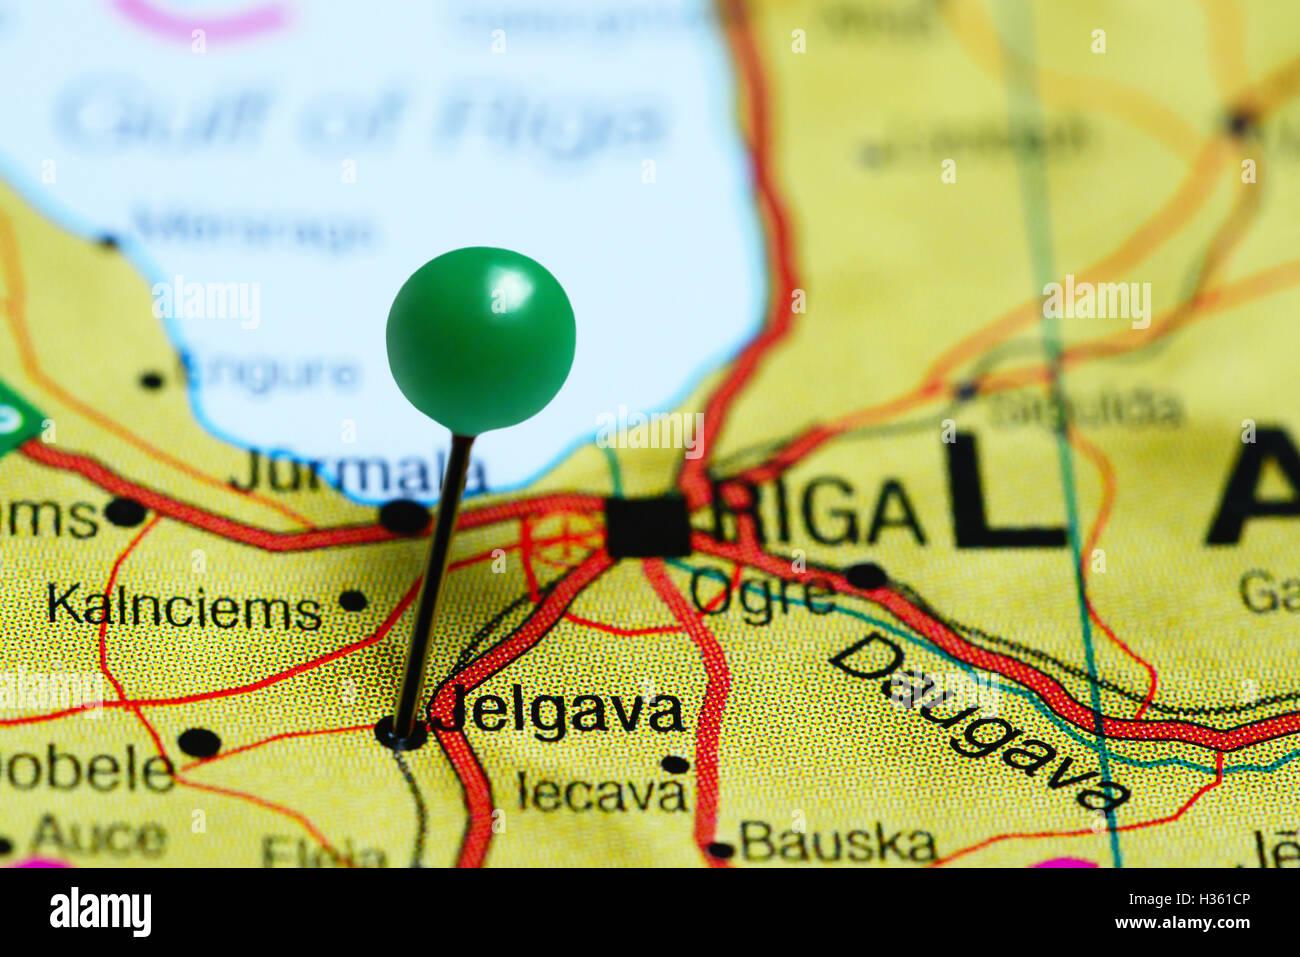 Jelgava pinned on a map of Latvia Stock Photo 122449398 Alamy